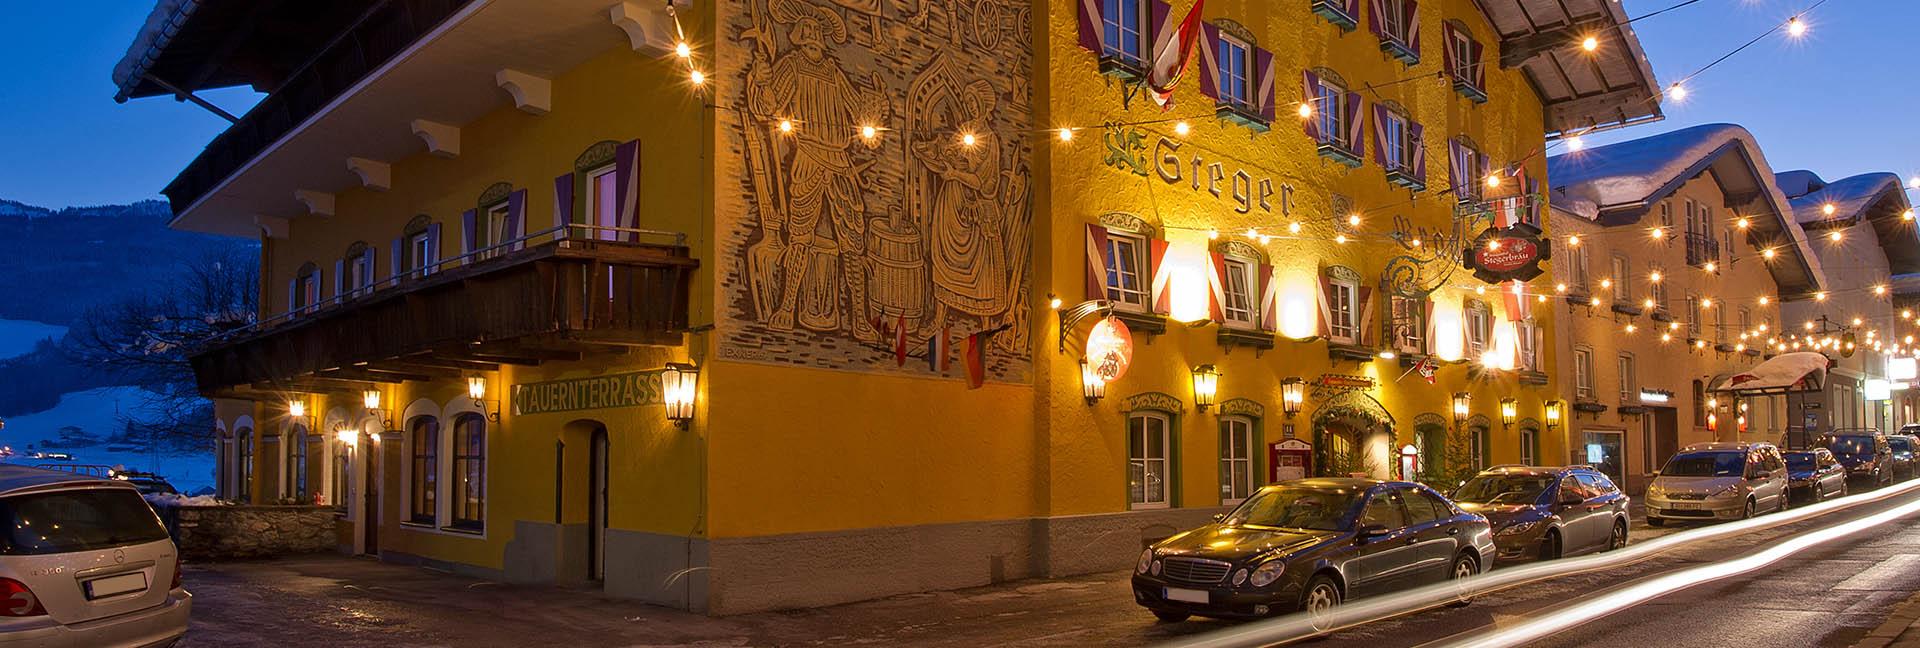 3 Sterne Hotel in Radstadt - Hotel Gasthof Stegerbräu